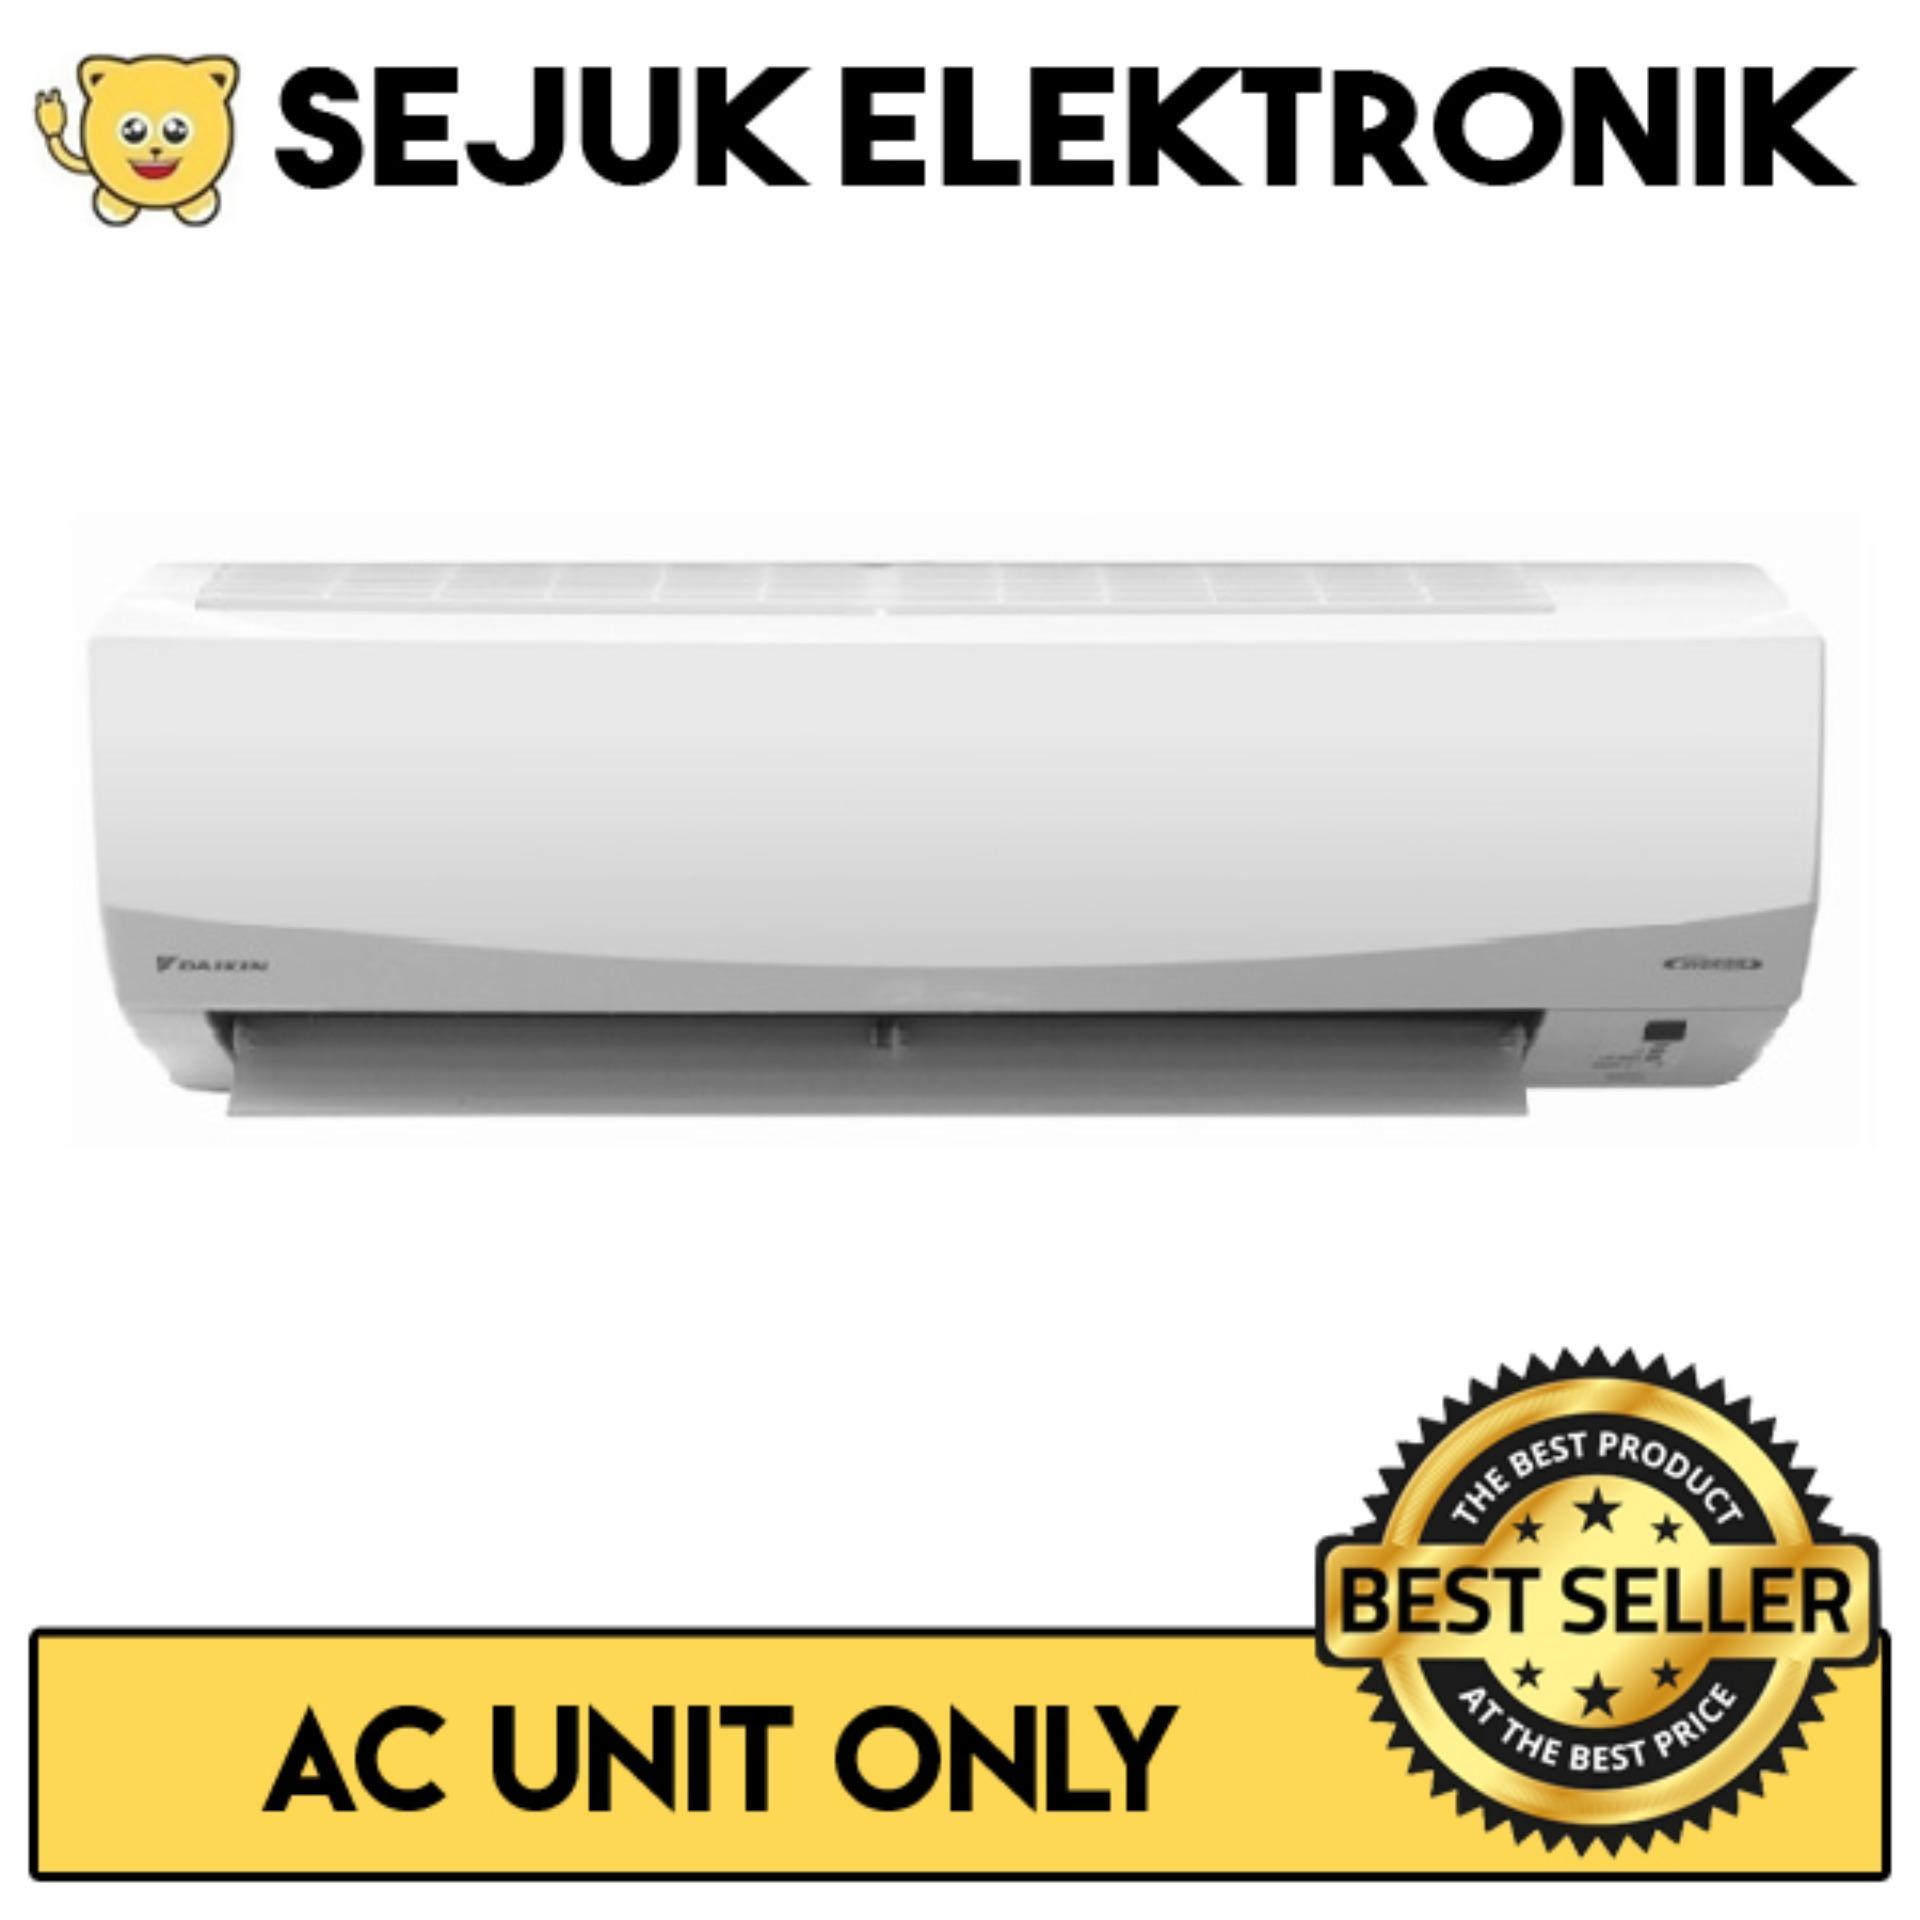 AC Daikin FTKC20PVM4 3/4PK AC Smile Inverter - Putih JAKARTA ONLY